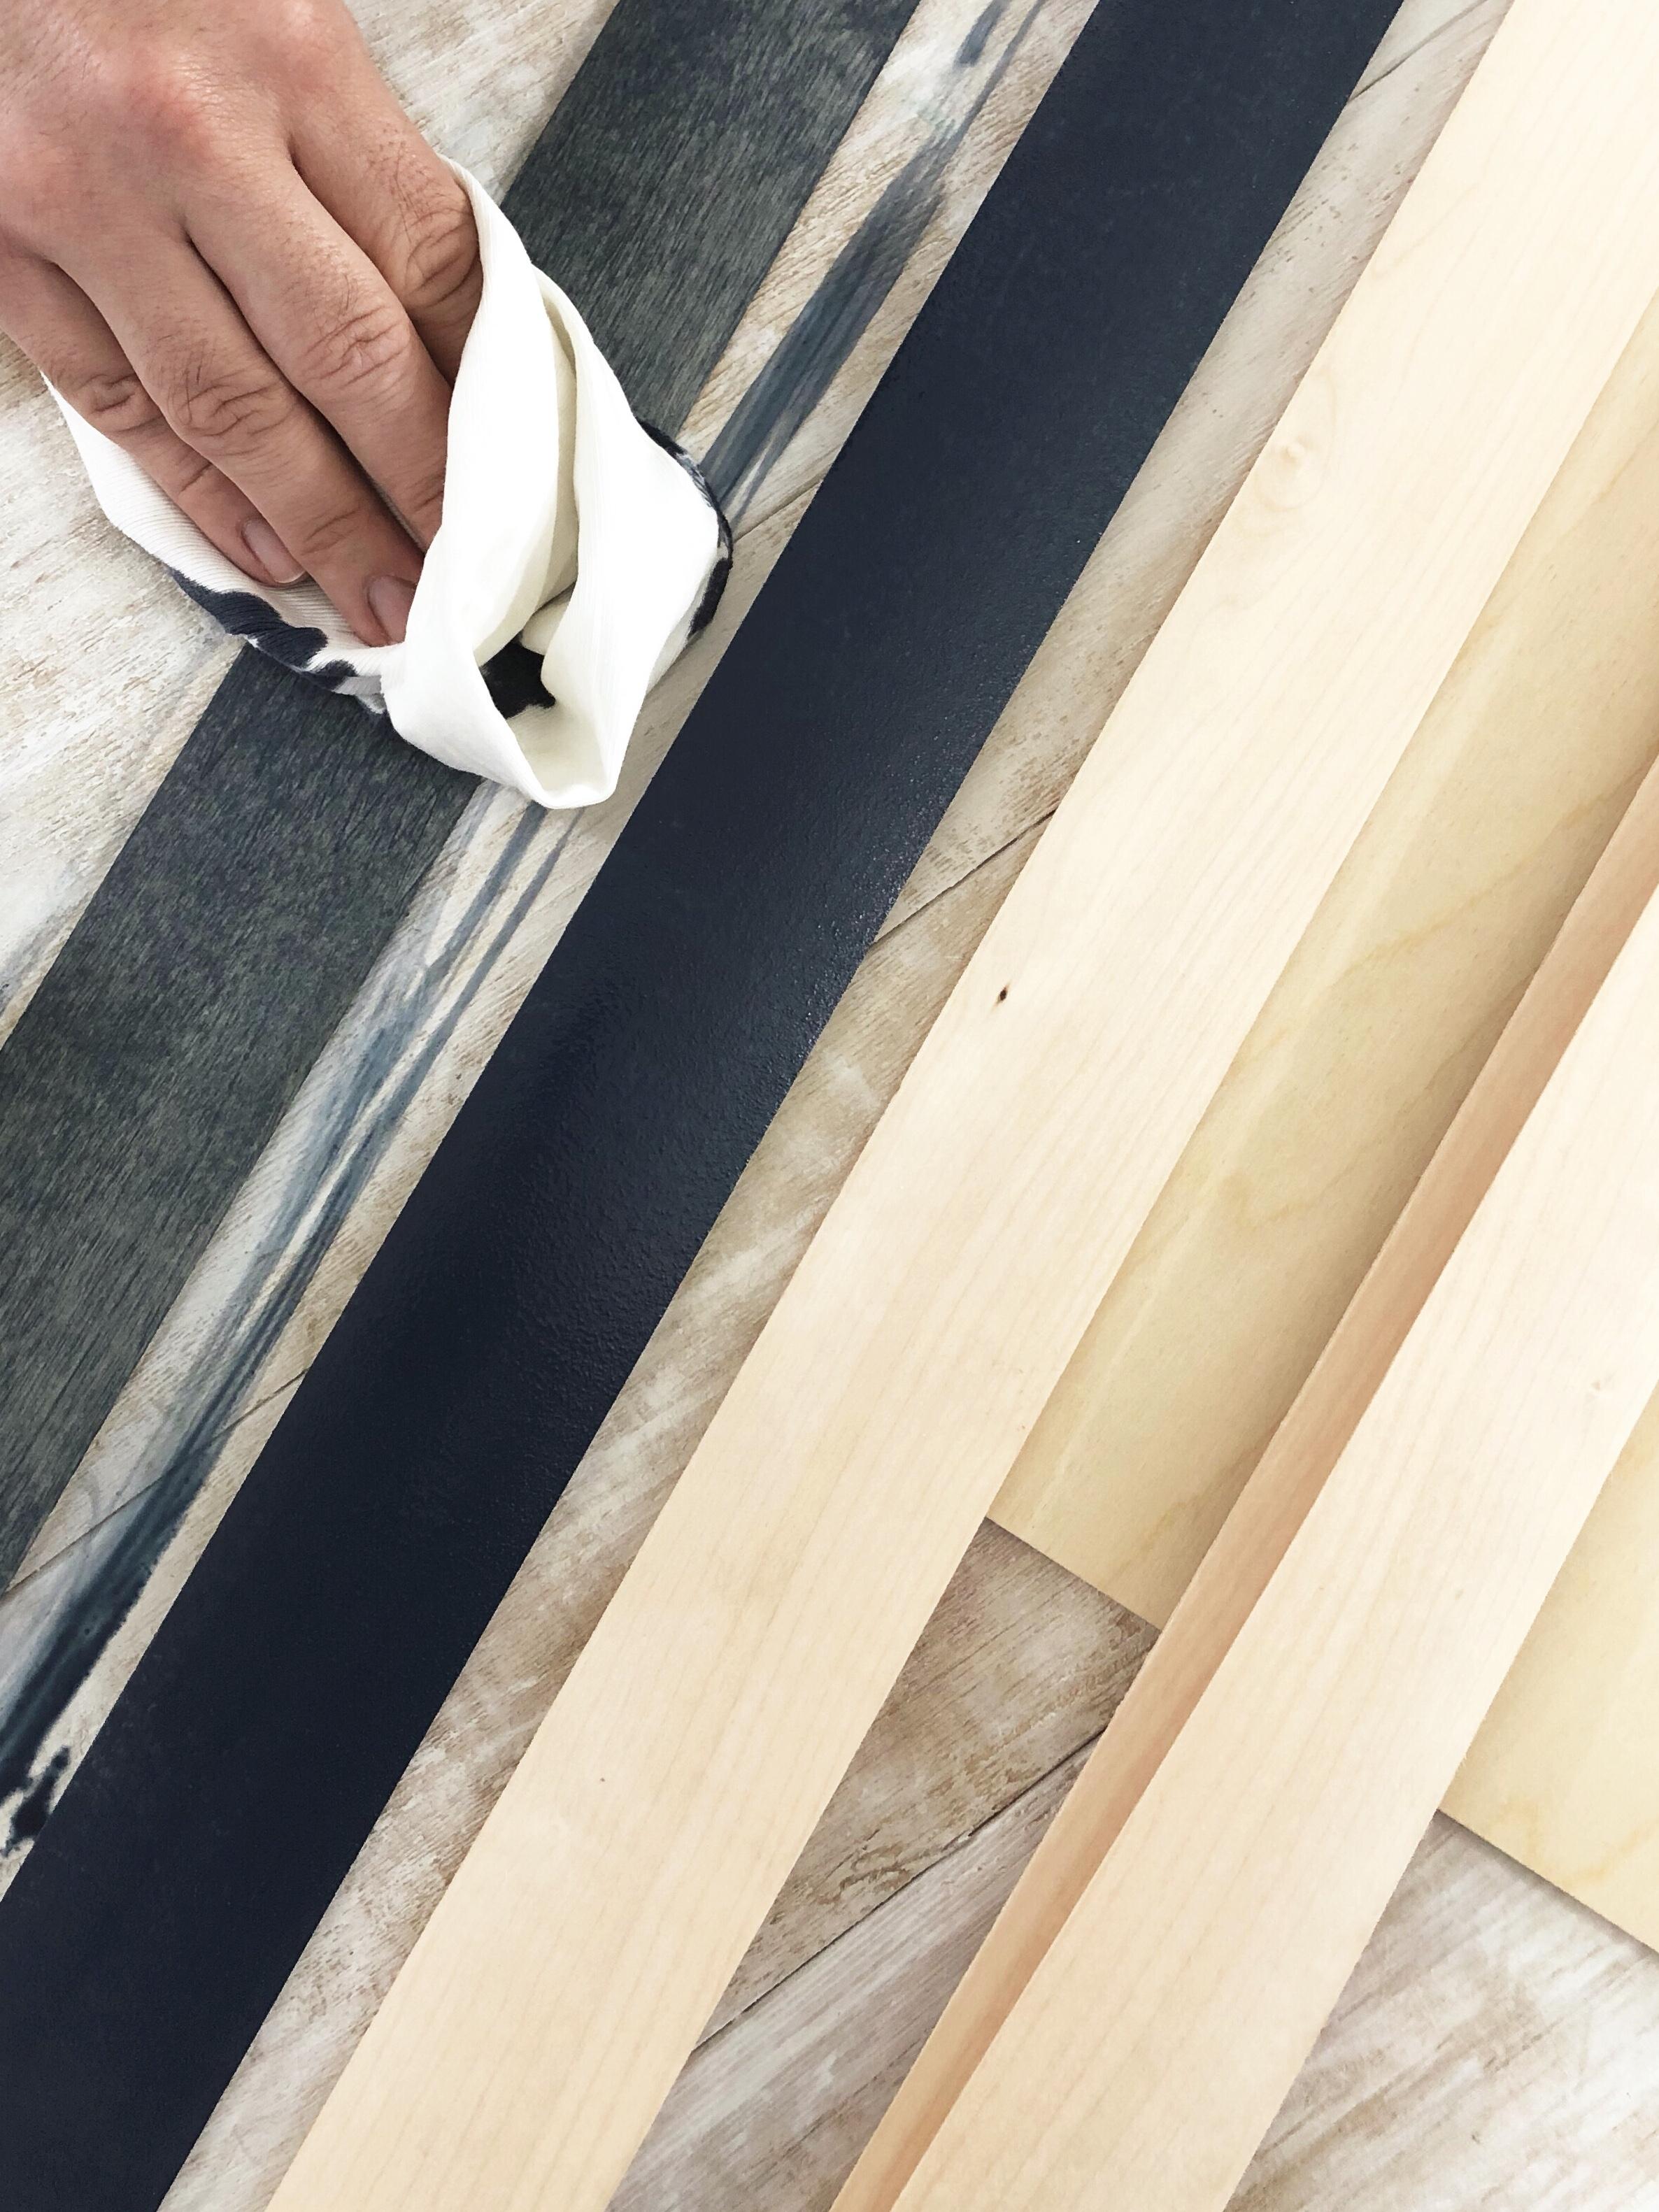 DIY Wood Veneer Art Project! Create your own wood veneer wall art using adhesive wood veneer strips! #woodveneer #homedecor #wallart #wood #woodveneer #woodstain #varathane #smallspaceliving #apartmentsolutions #woodstaining #gotwood #officedecor #deskdecor #deskupdo #easywallart #irononwoodveneers #diywallart